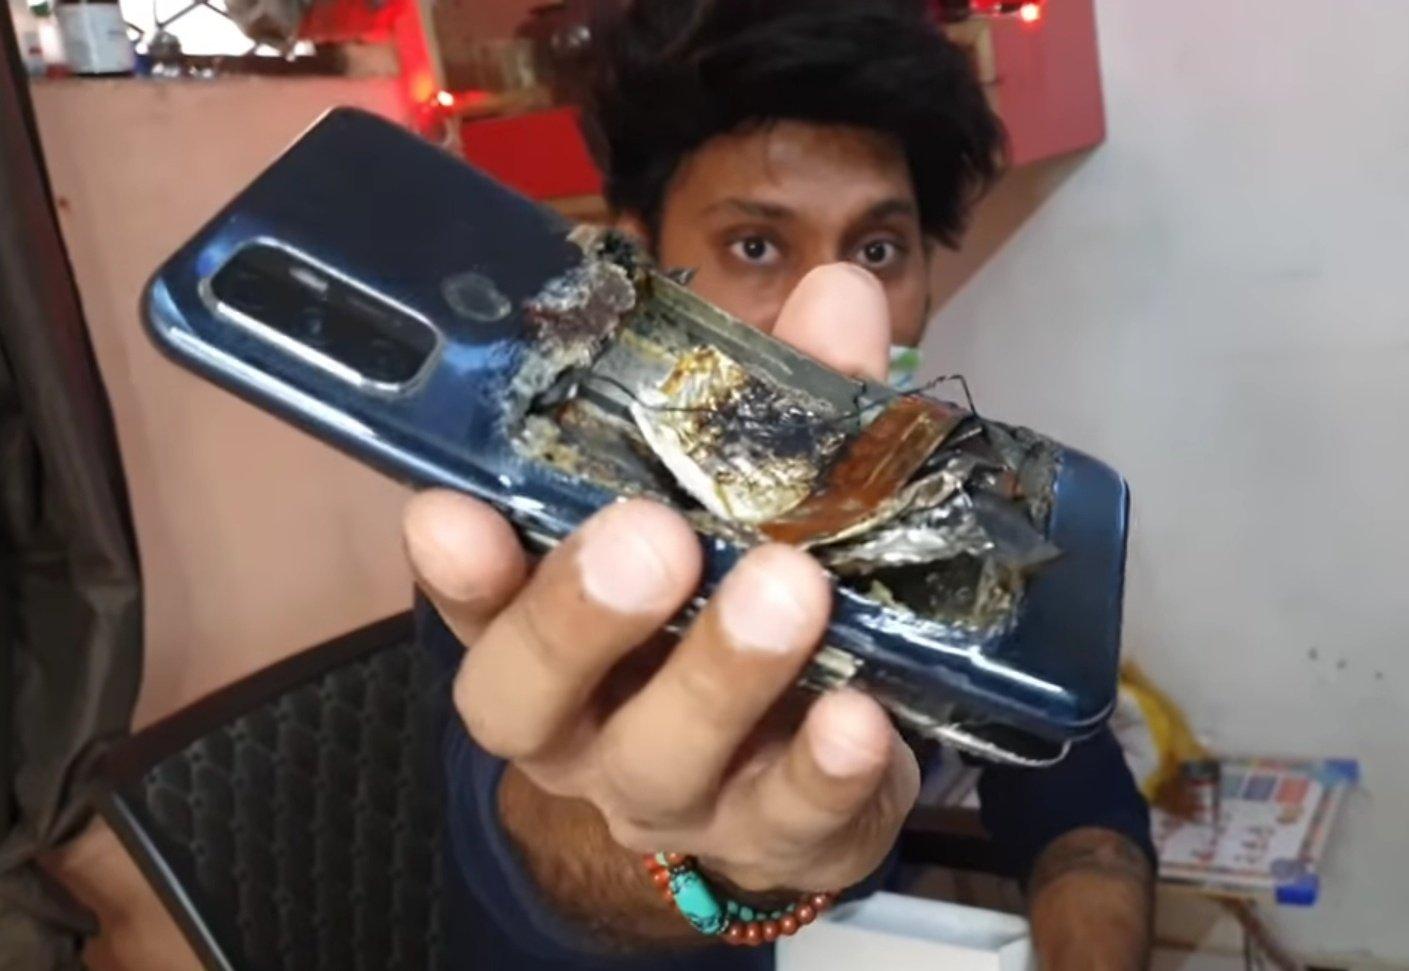 OPPO A53 взорвался у владельца в кармане Другие устройства  - smartfon_oppo_pokalechil_vladelca_vzorvavshis_v_karmane_picture2_0